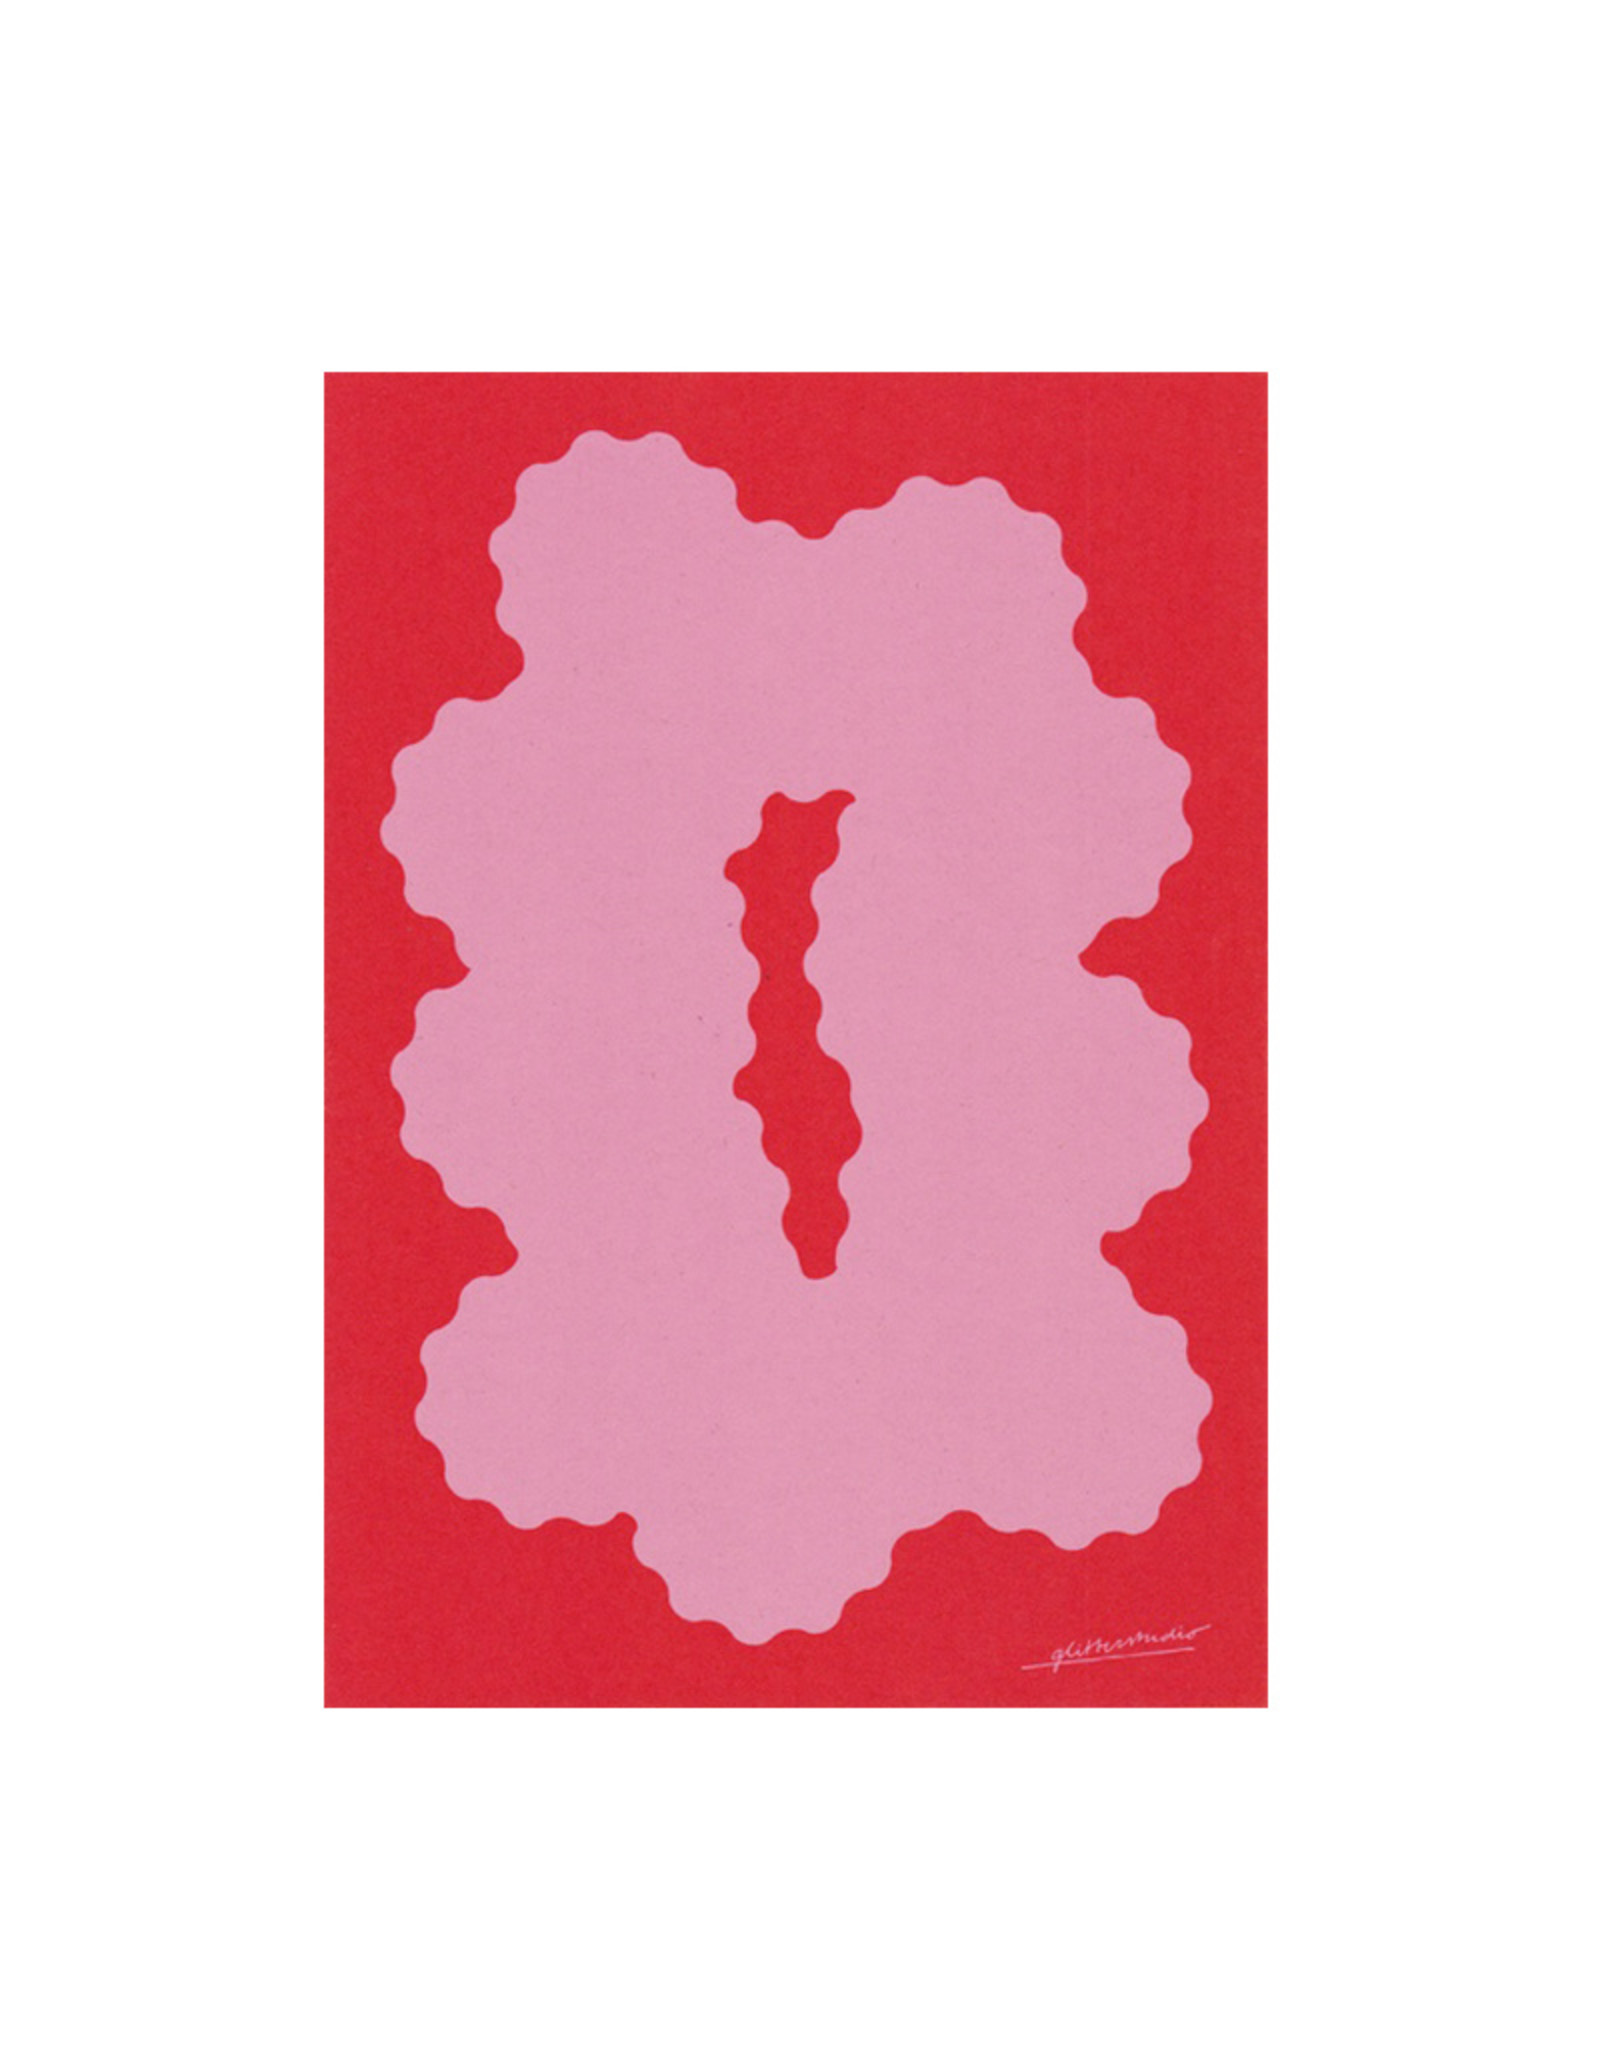 Glitterstudio Flobber - Art Prints A4